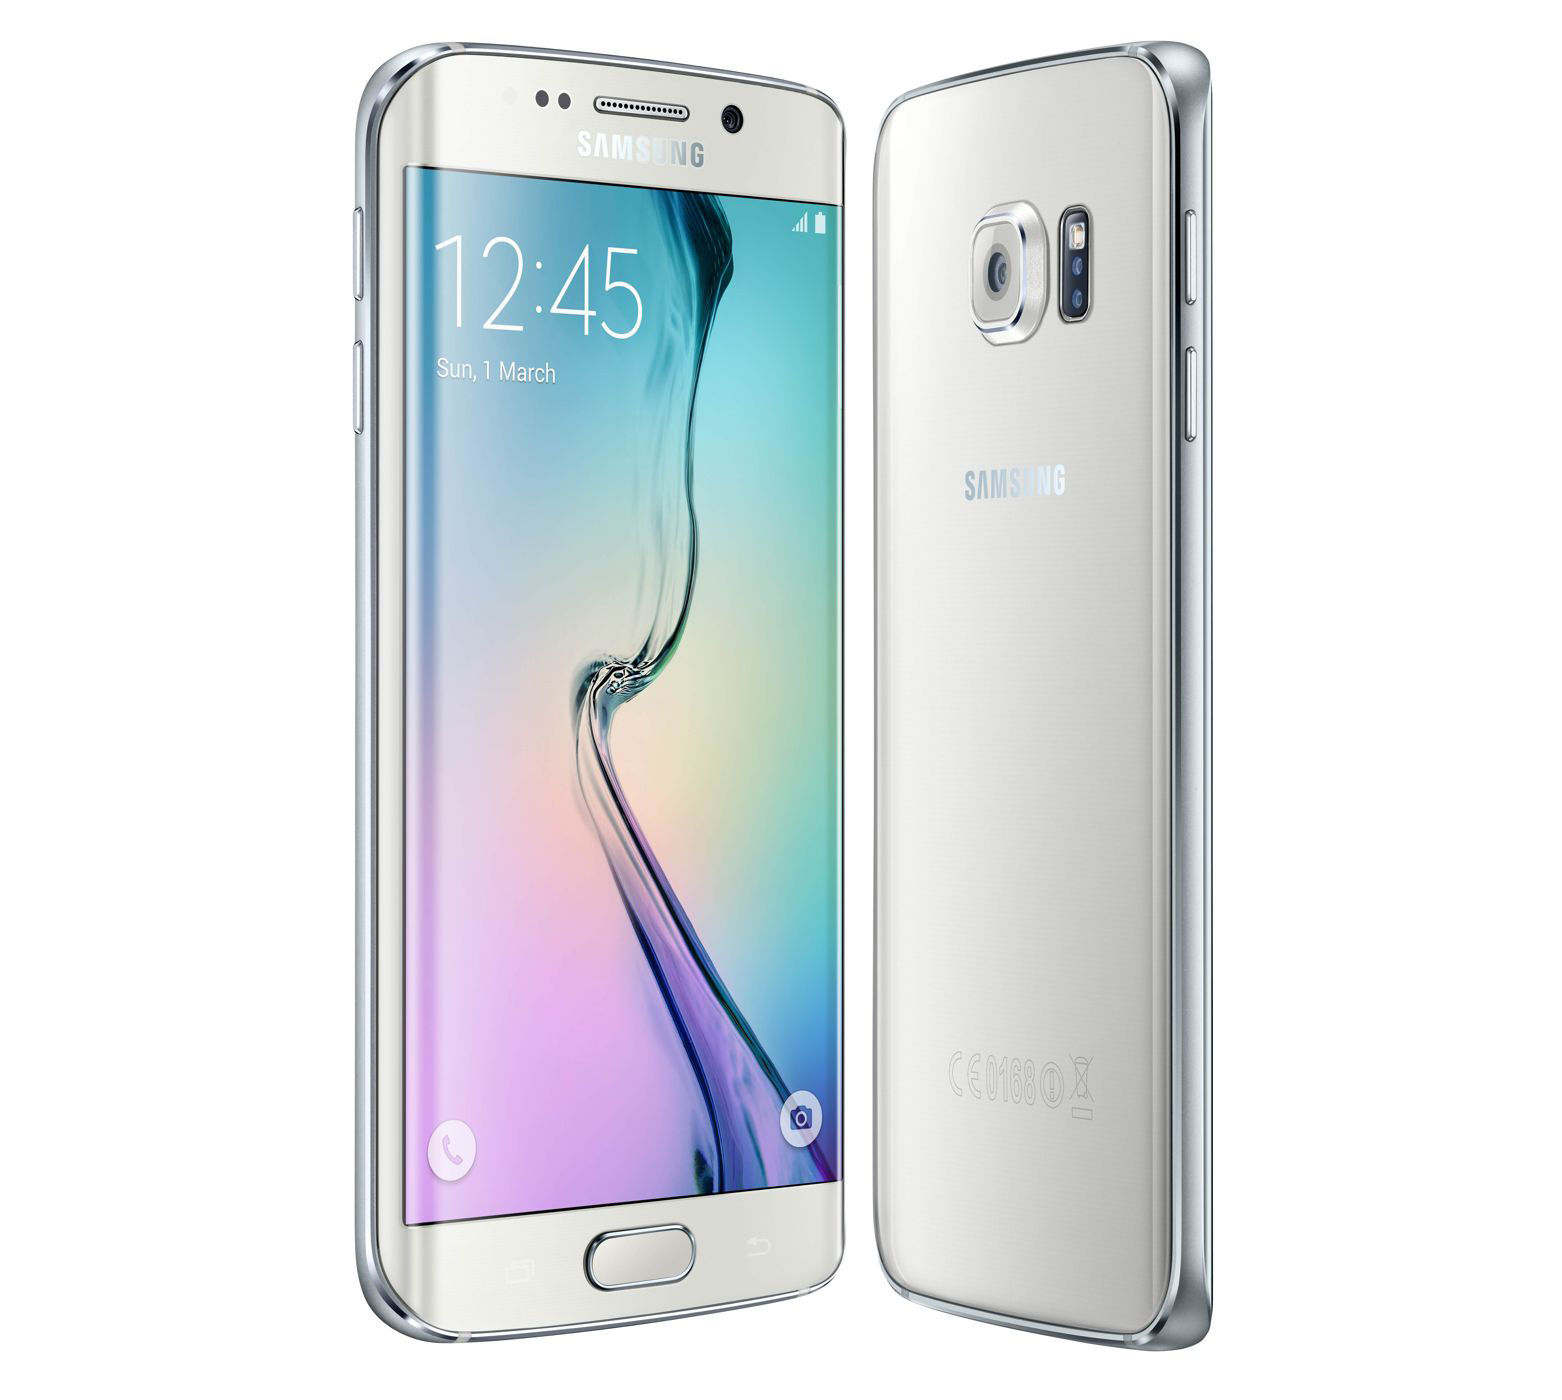 Samsung Galaxy S6 Edge Verizon GSM Unlocked Black and White_3